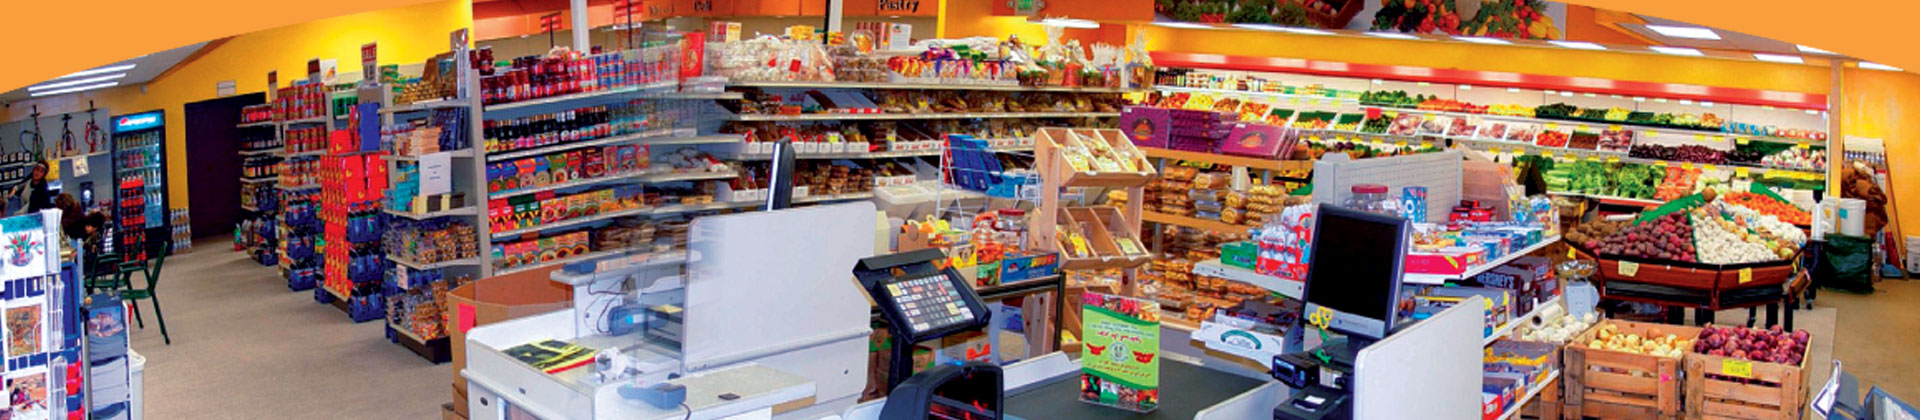 Balboa International Market | International Food Market